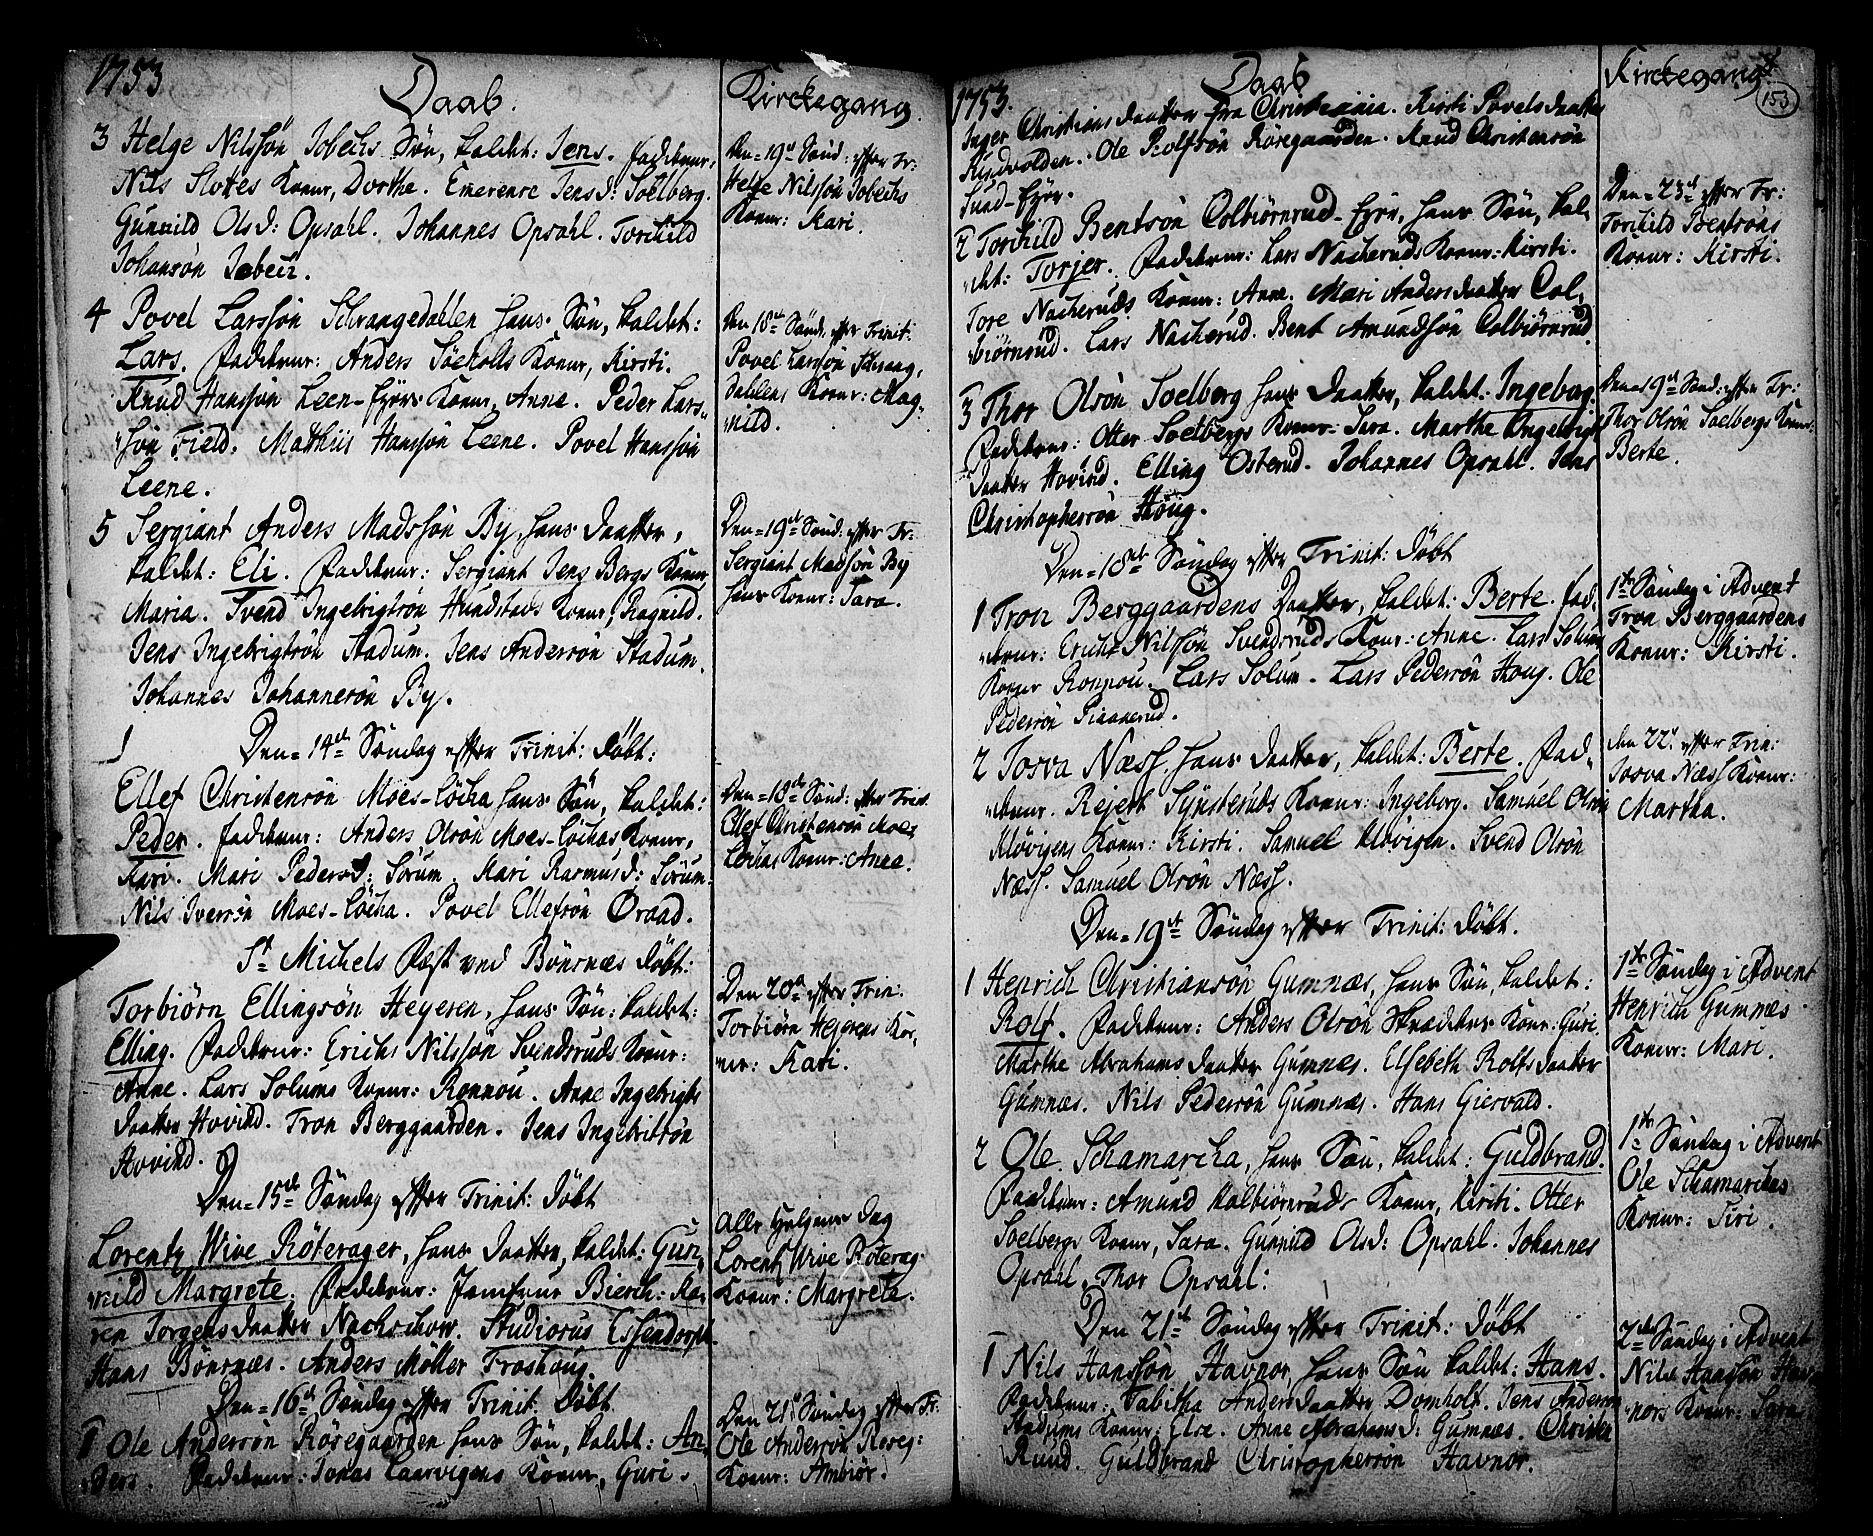 SAKO, Hole kirkebøker, F/Fa/L0001: Ministerialbok nr. I 1, 1716-1765, s. 153